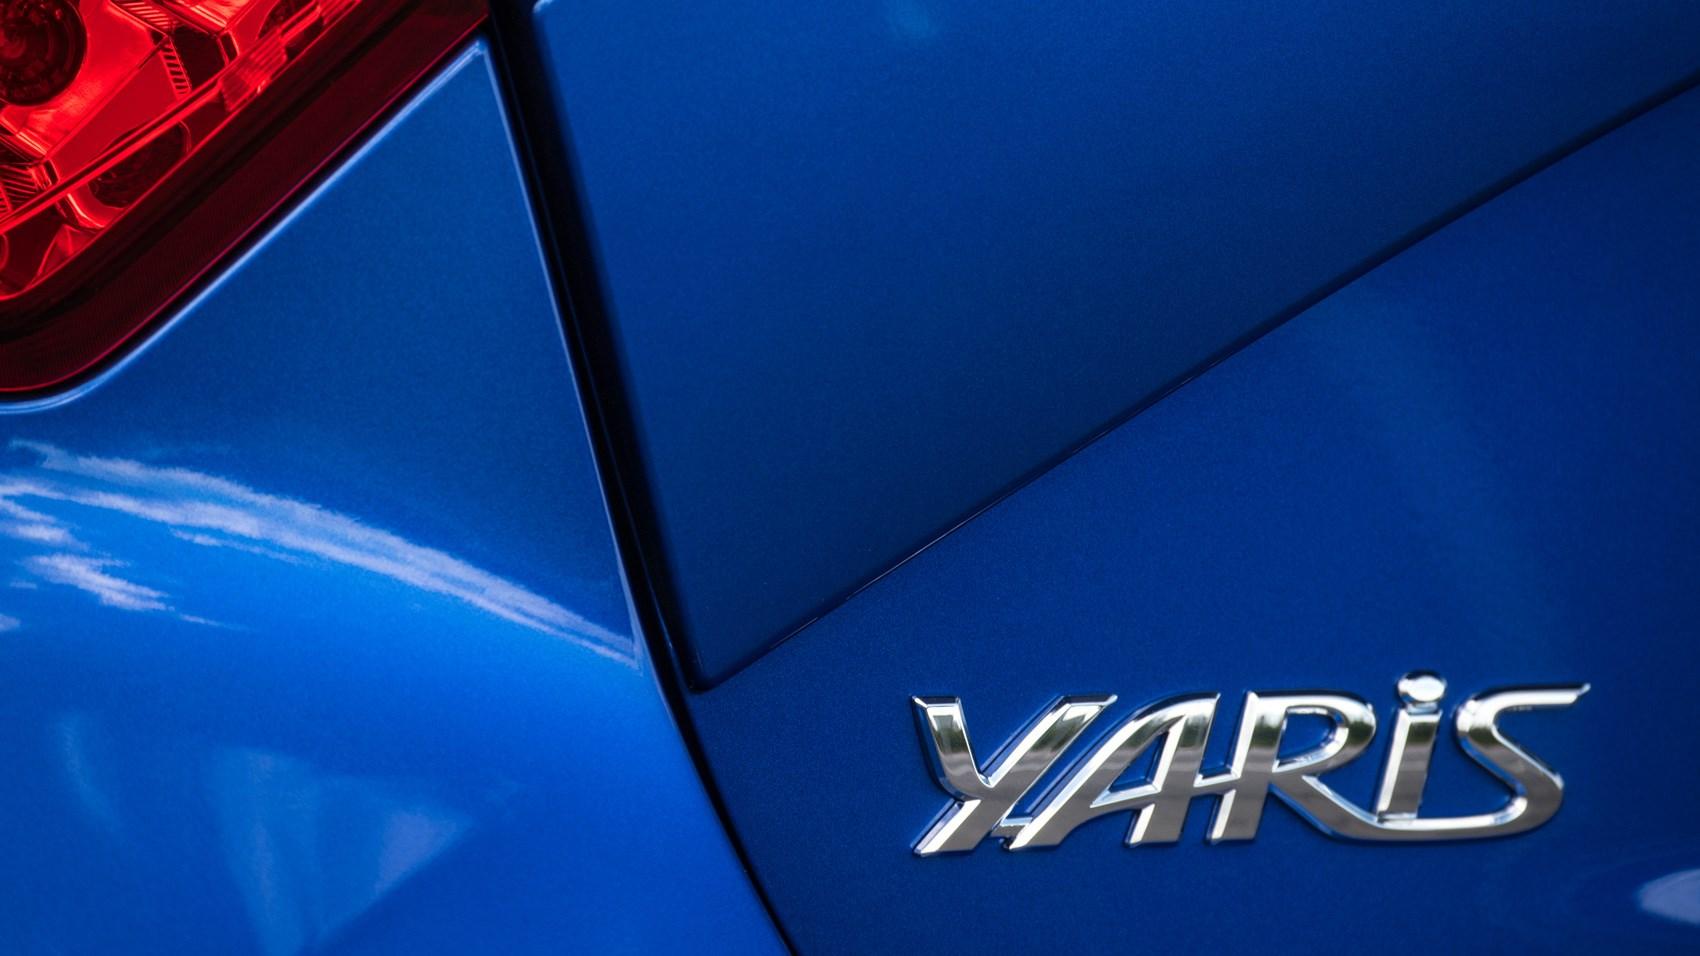 Toyota Yaris UK badge